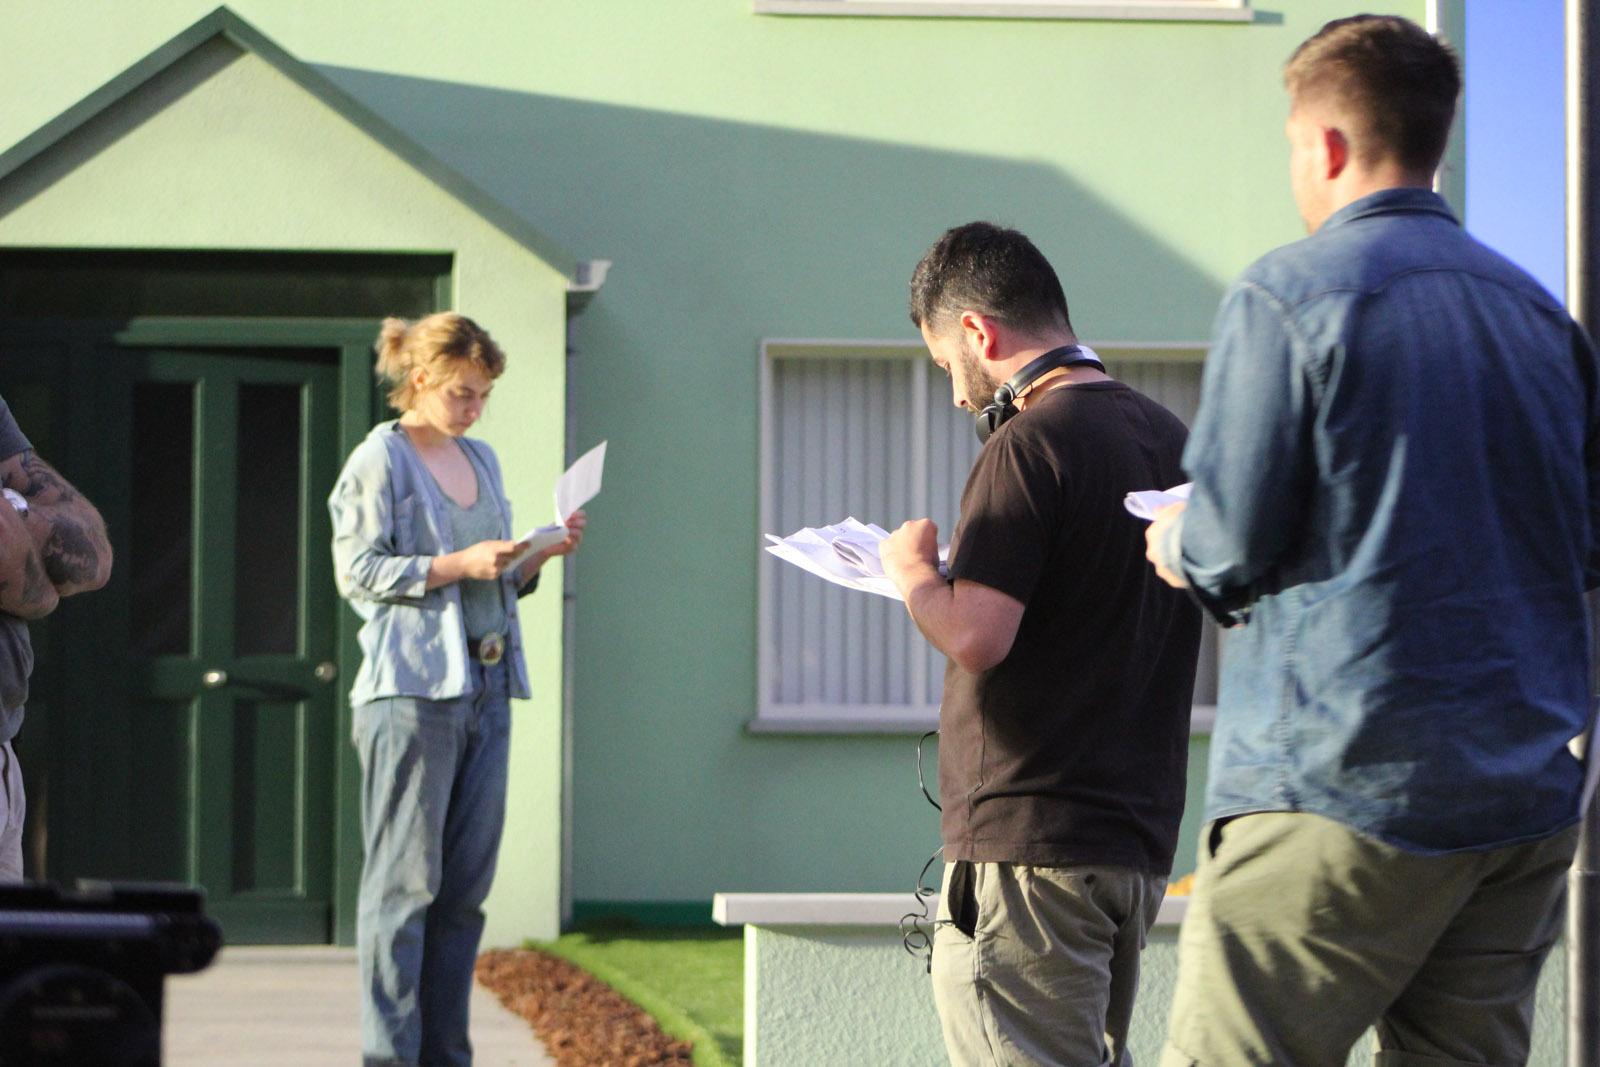 0116 BTS Imogen Poots (Gemma), Lorcan Finnegan (Director) and crew - John McDonnell